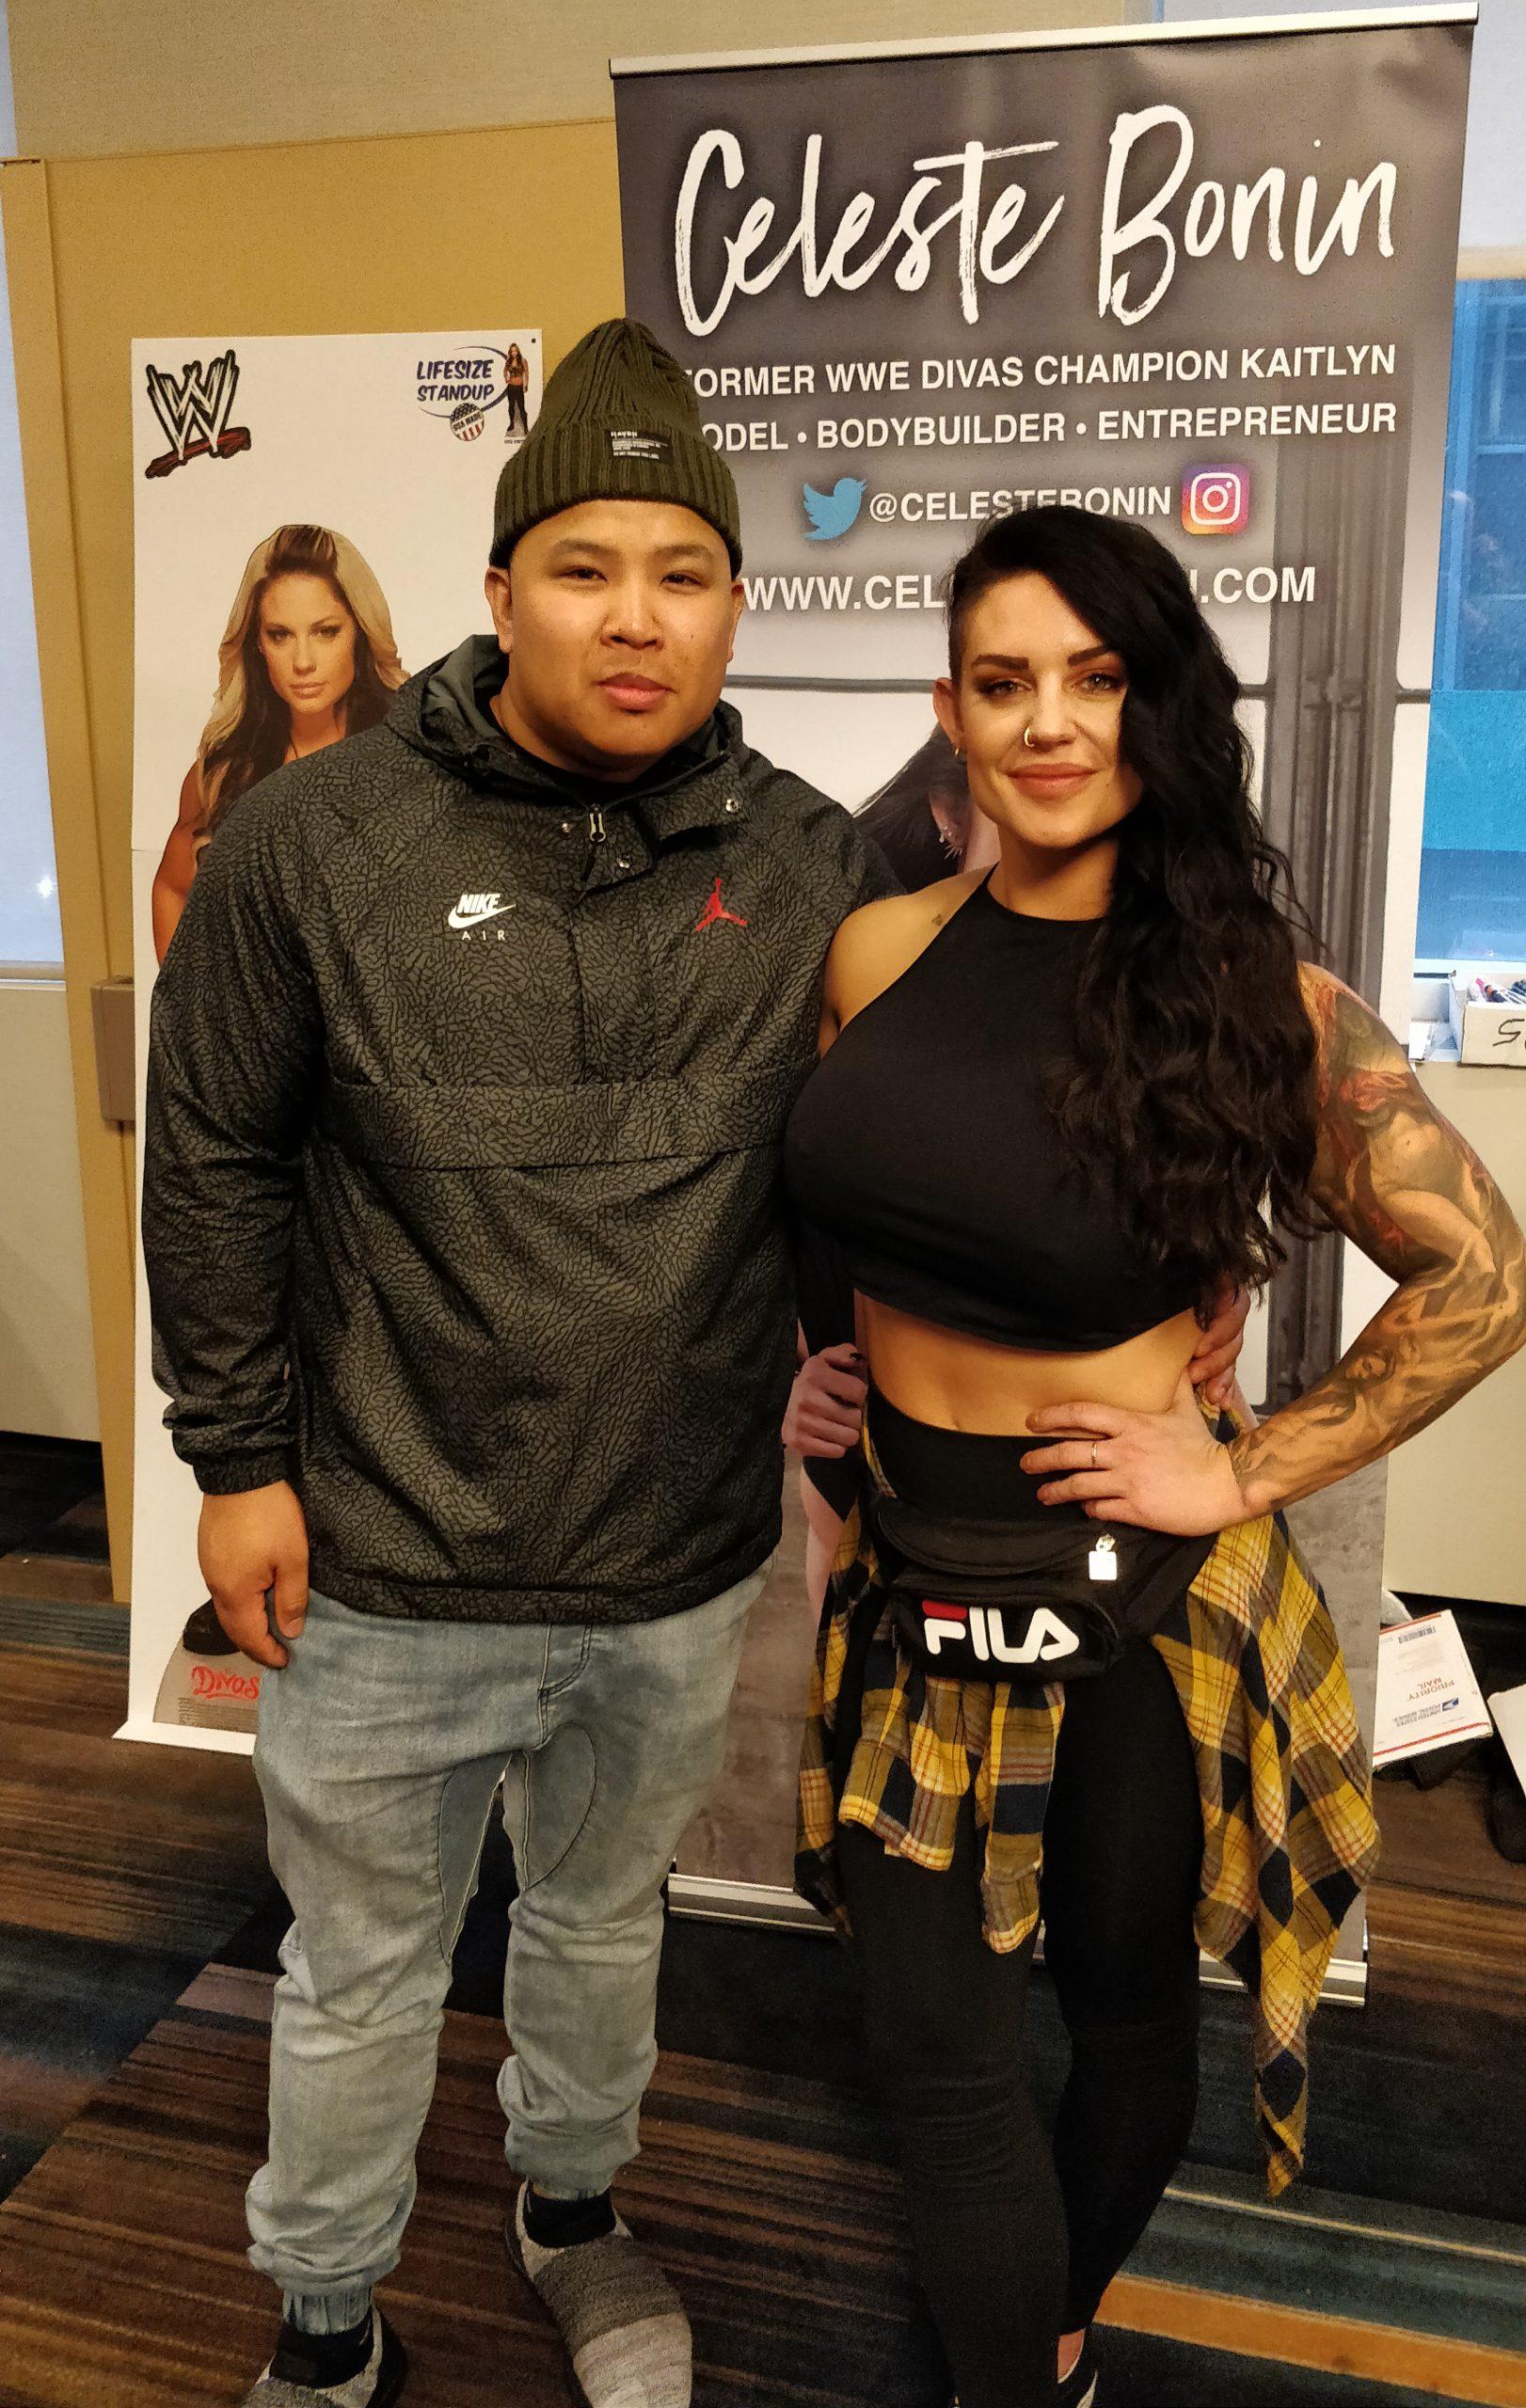 Wayne Lapasa with Celeste Bonin FKA WWE Diva Kaitlyn WrestleCon New York